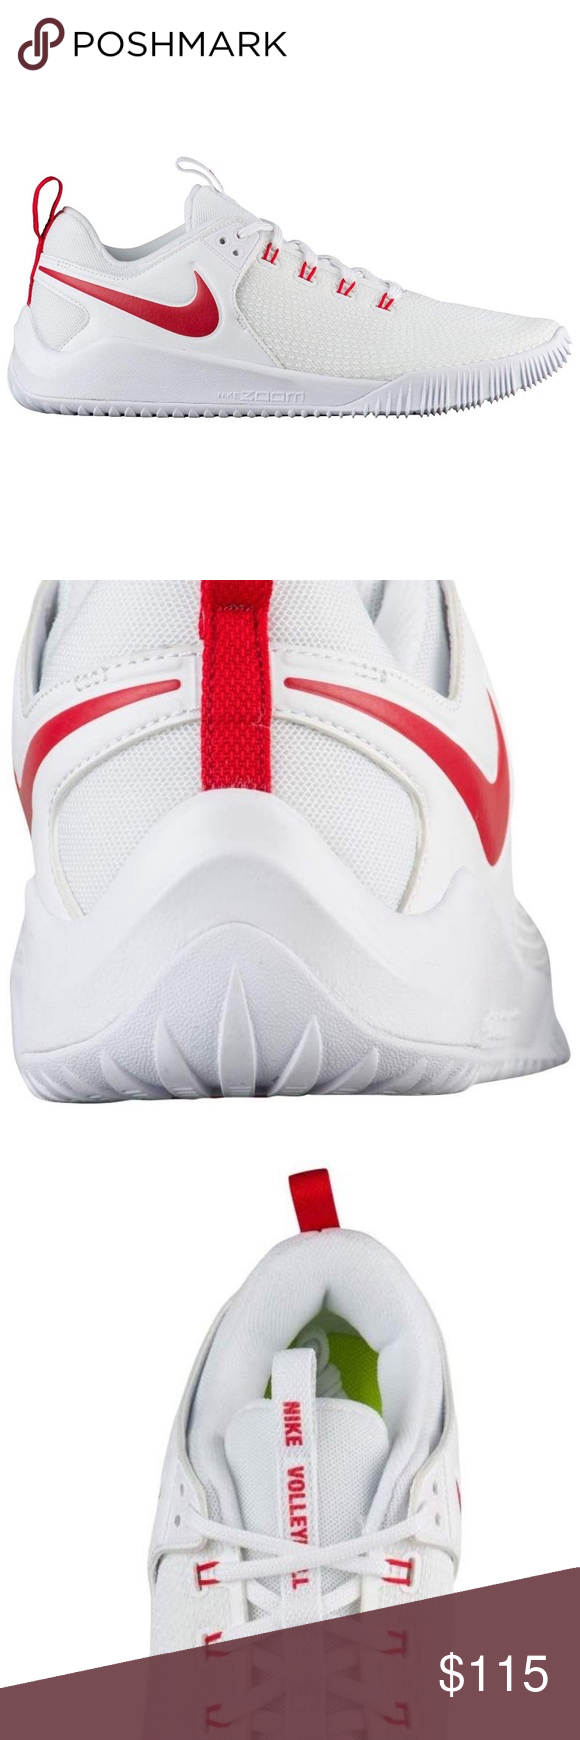 Nike Womens Zoom Hyperace 2 Nwt In 2020 Nike Women Nike Volleyball Shoes